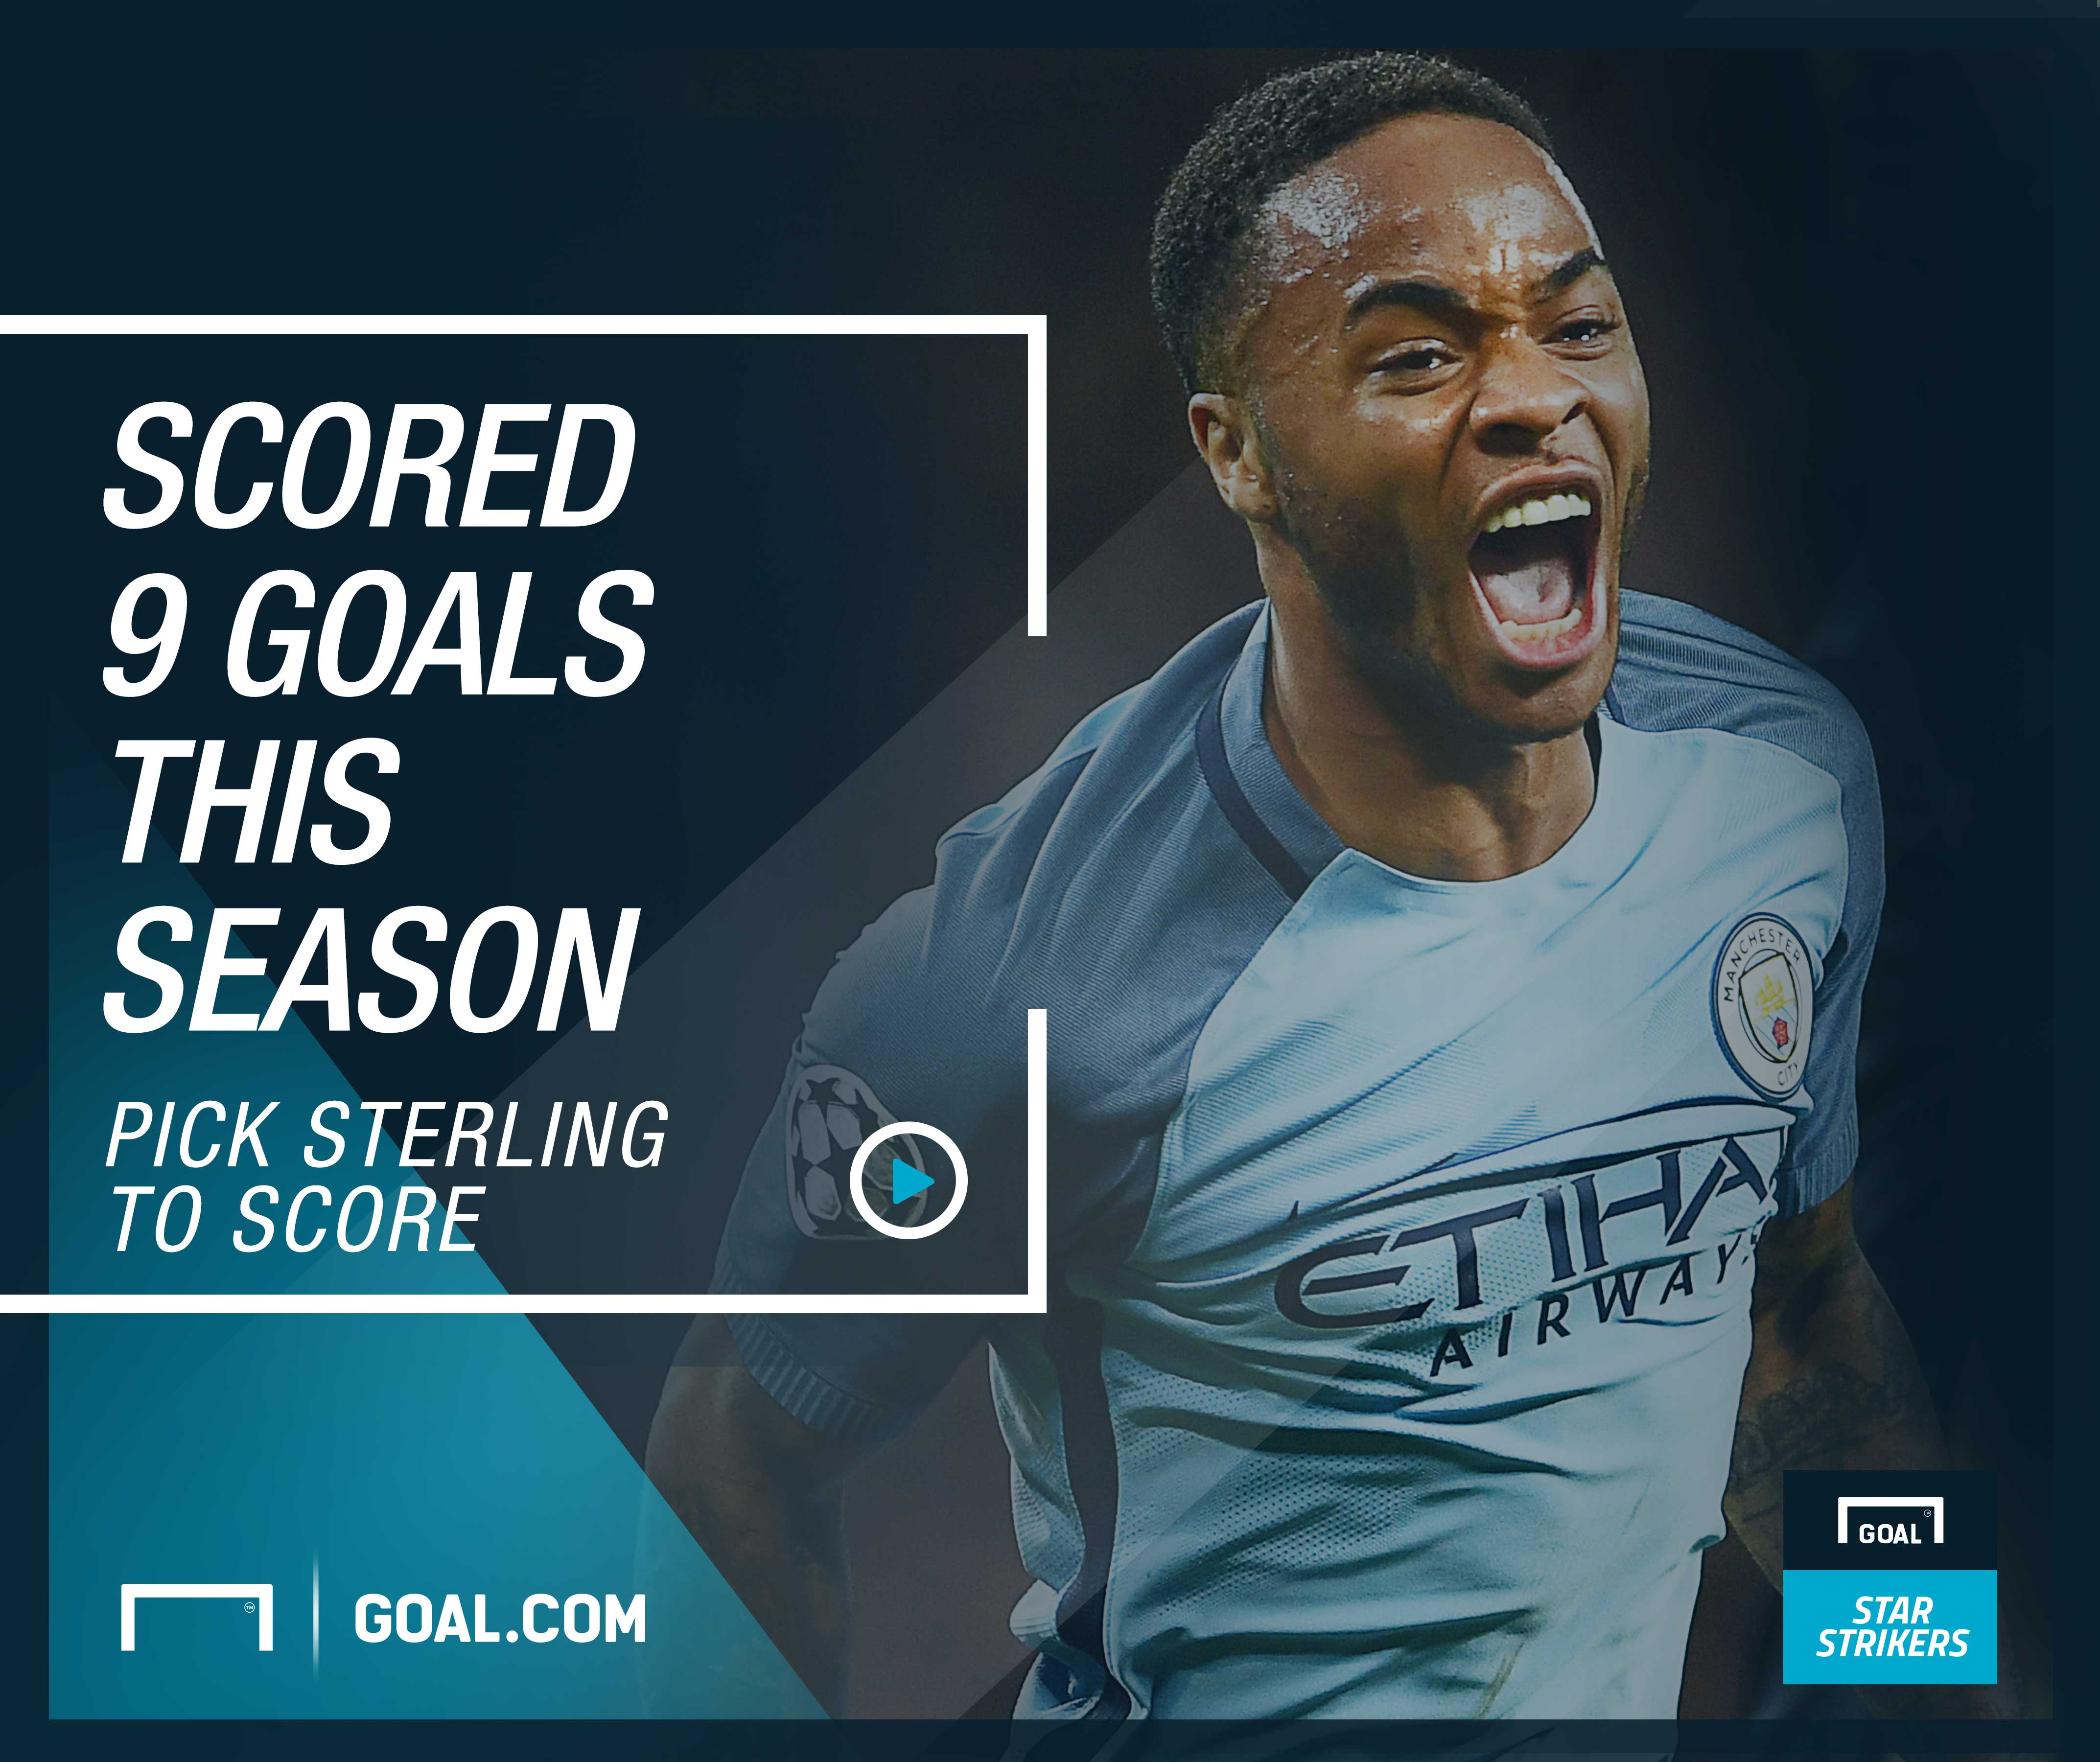 Sterling, Goal Star Strikers Article